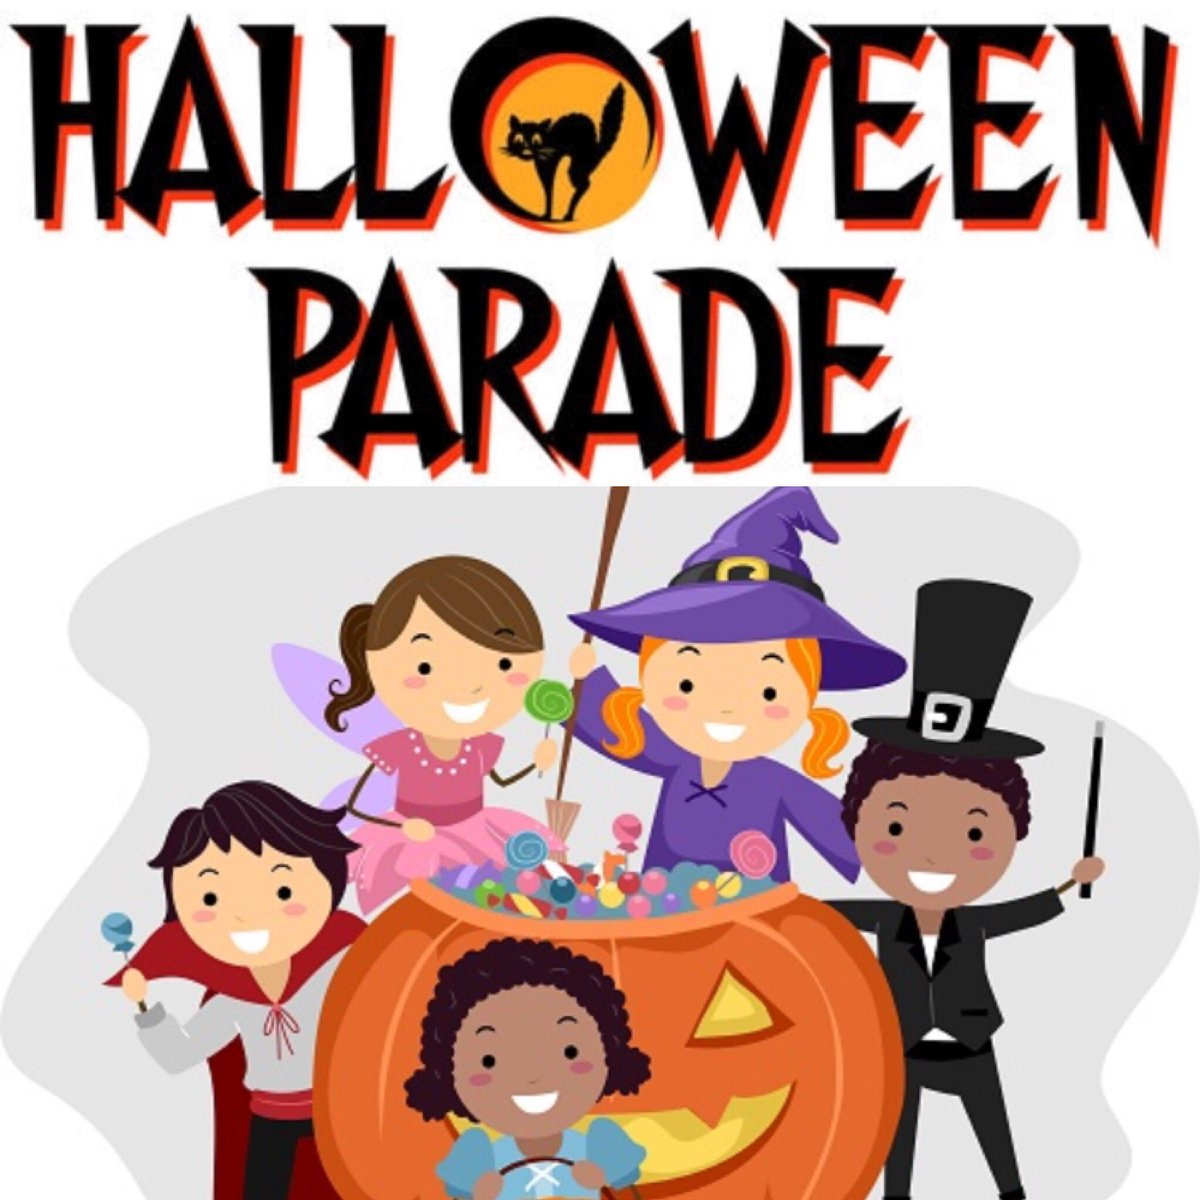 halloween-parade-clipart_960269